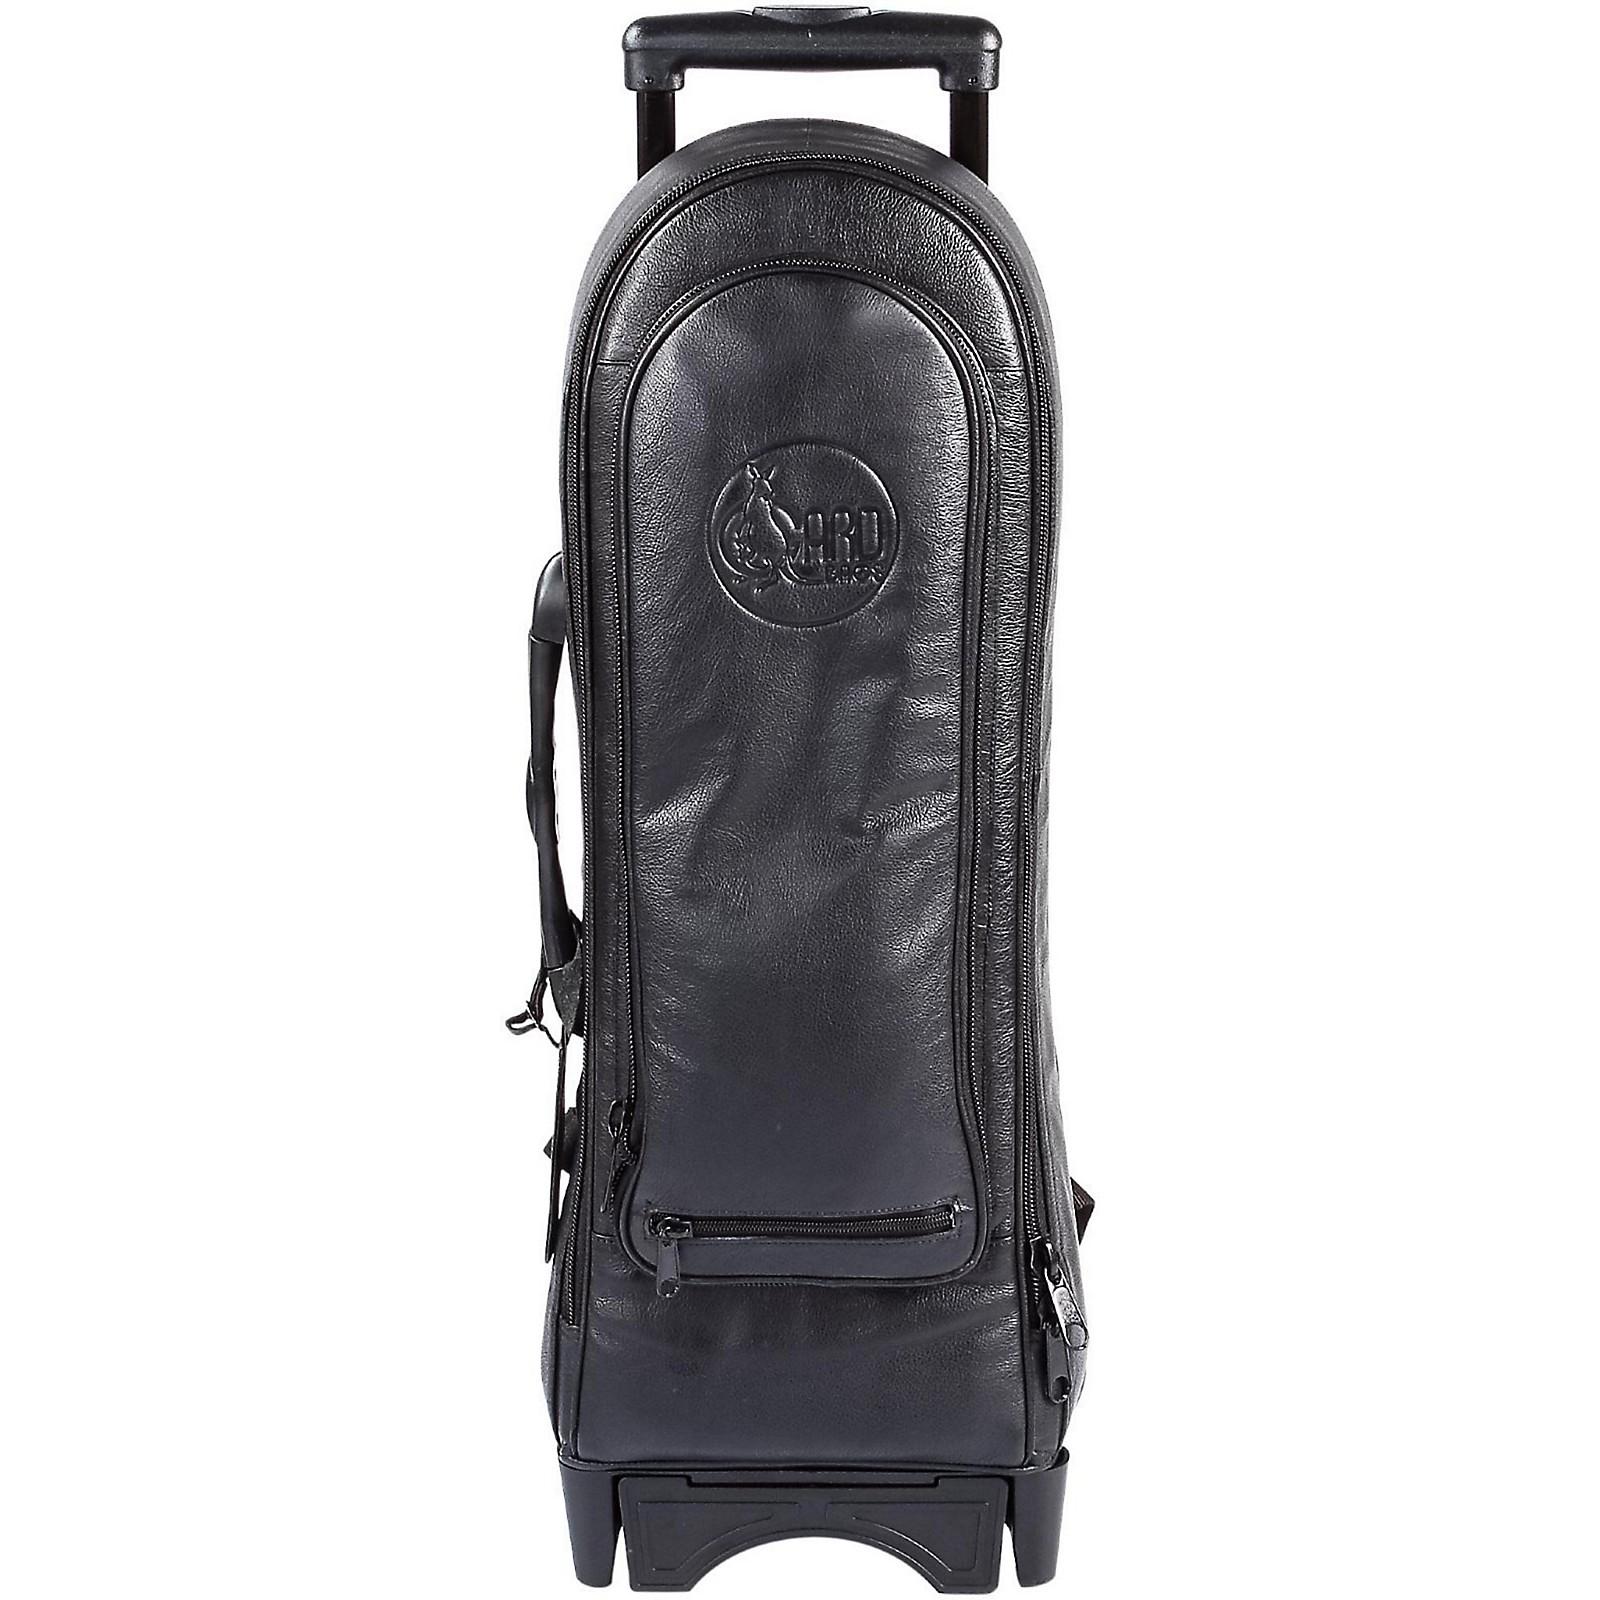 Gard Single Trumpet Wheelie Bag